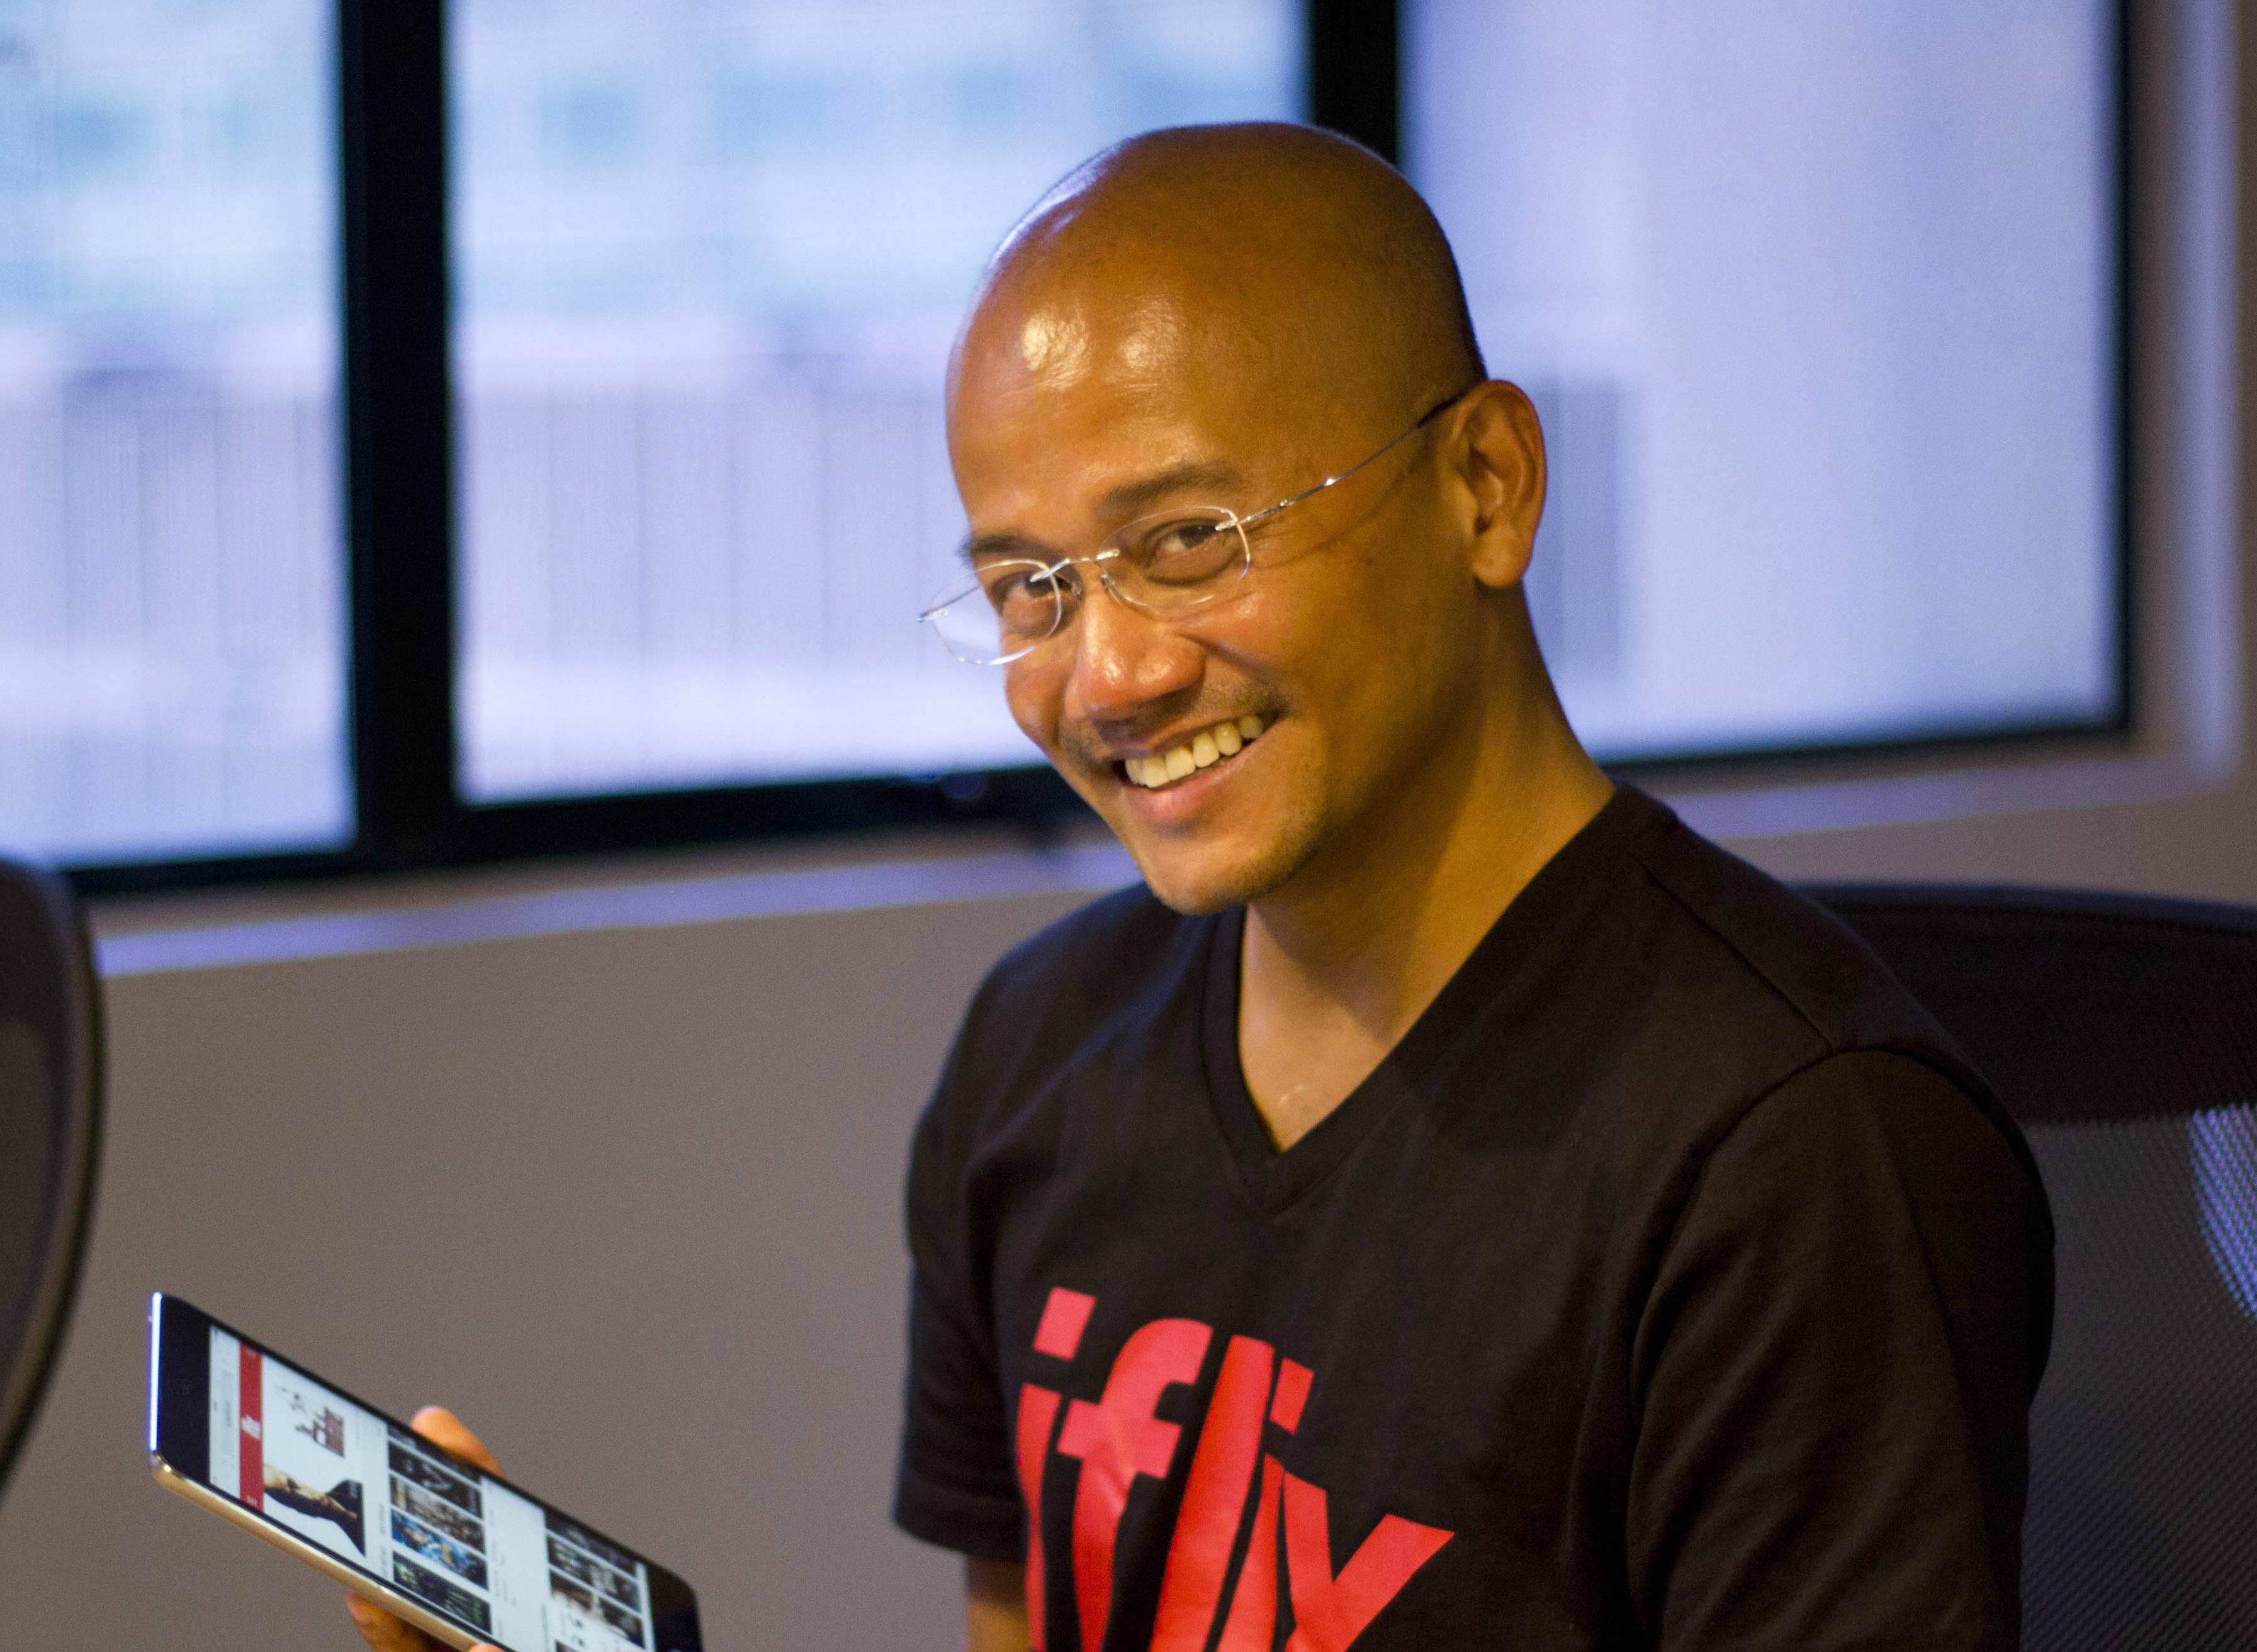 iFlix CEO Azran Osman-Rani